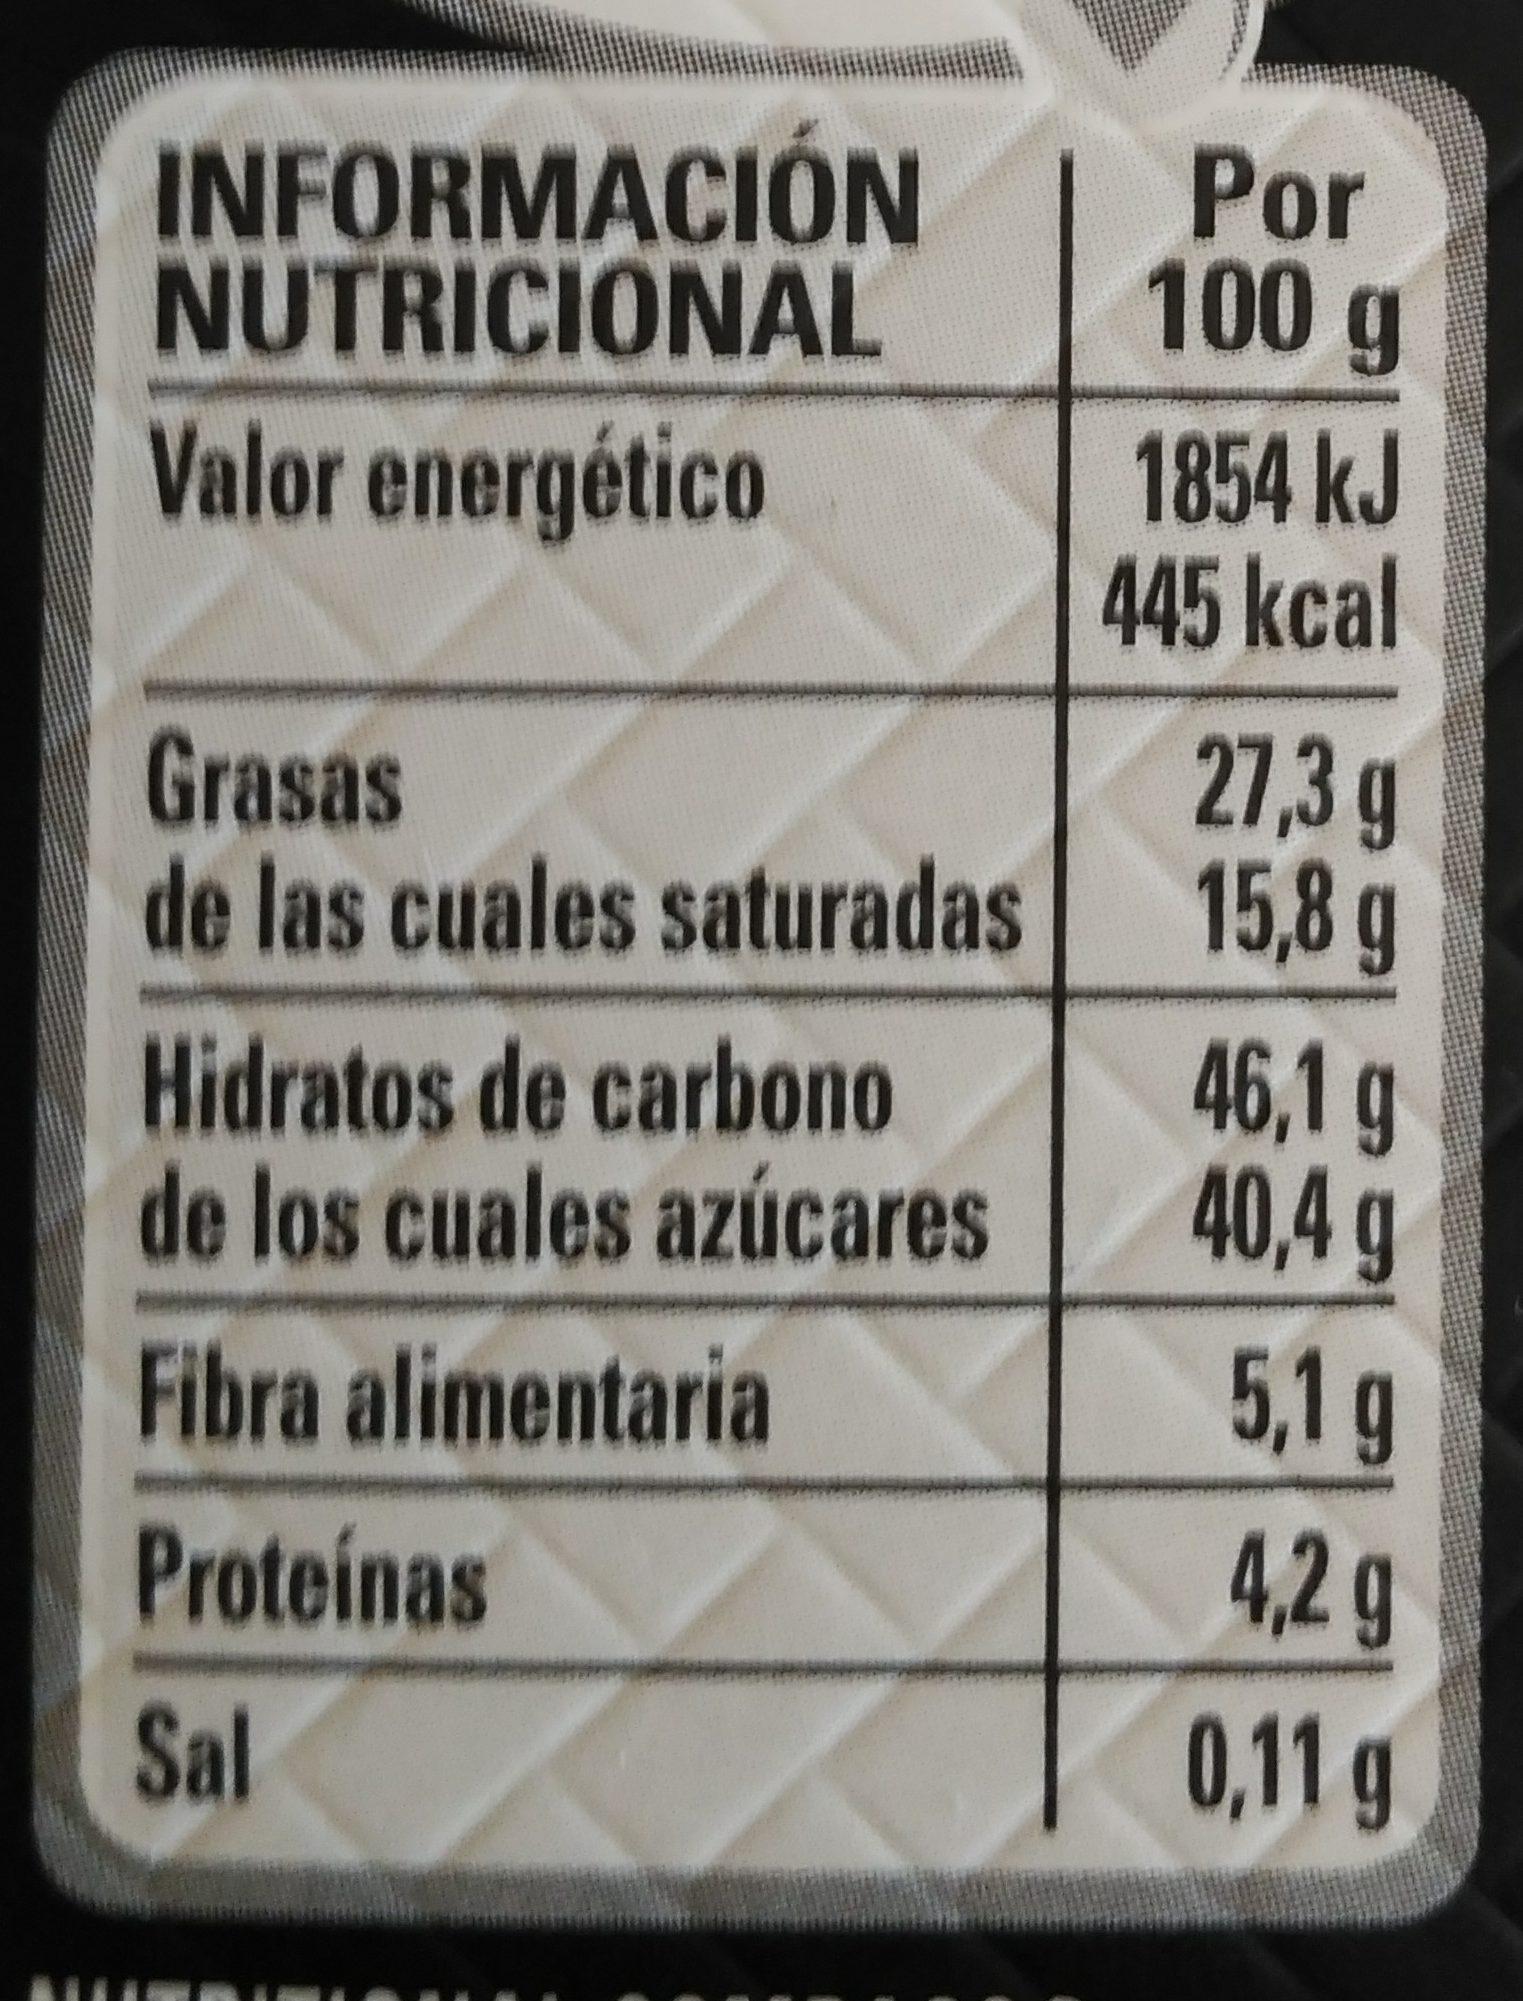 Bombones chocolate negro premium caja roja - Informació nutricional - es